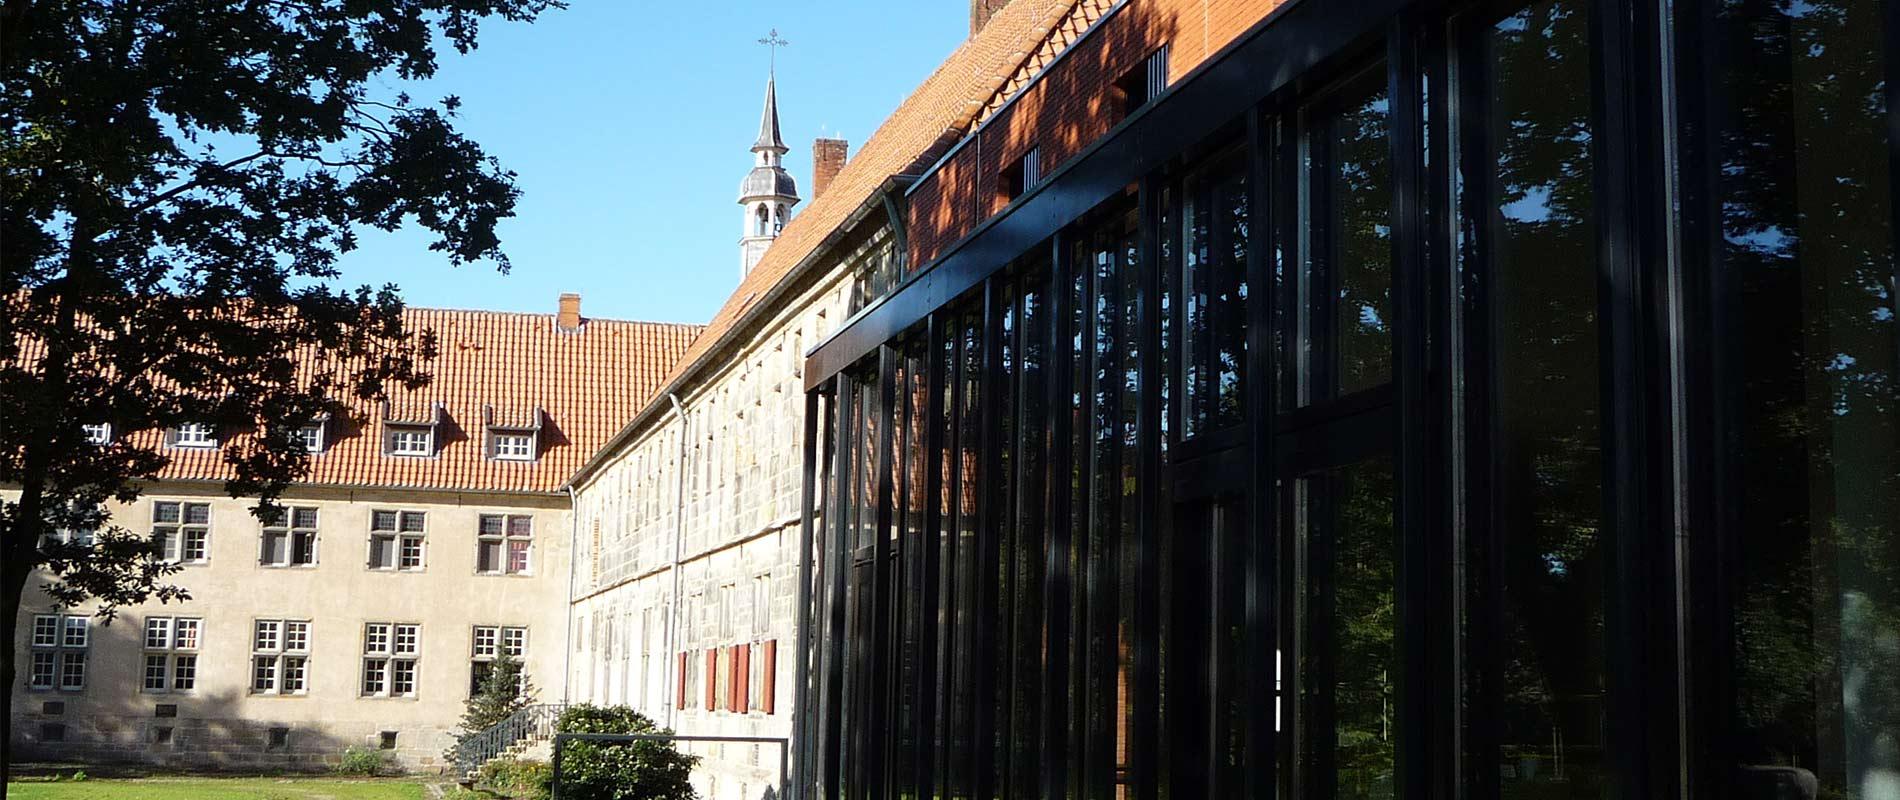 Referenz Kloster Frenswegen Nordhorn Rosink